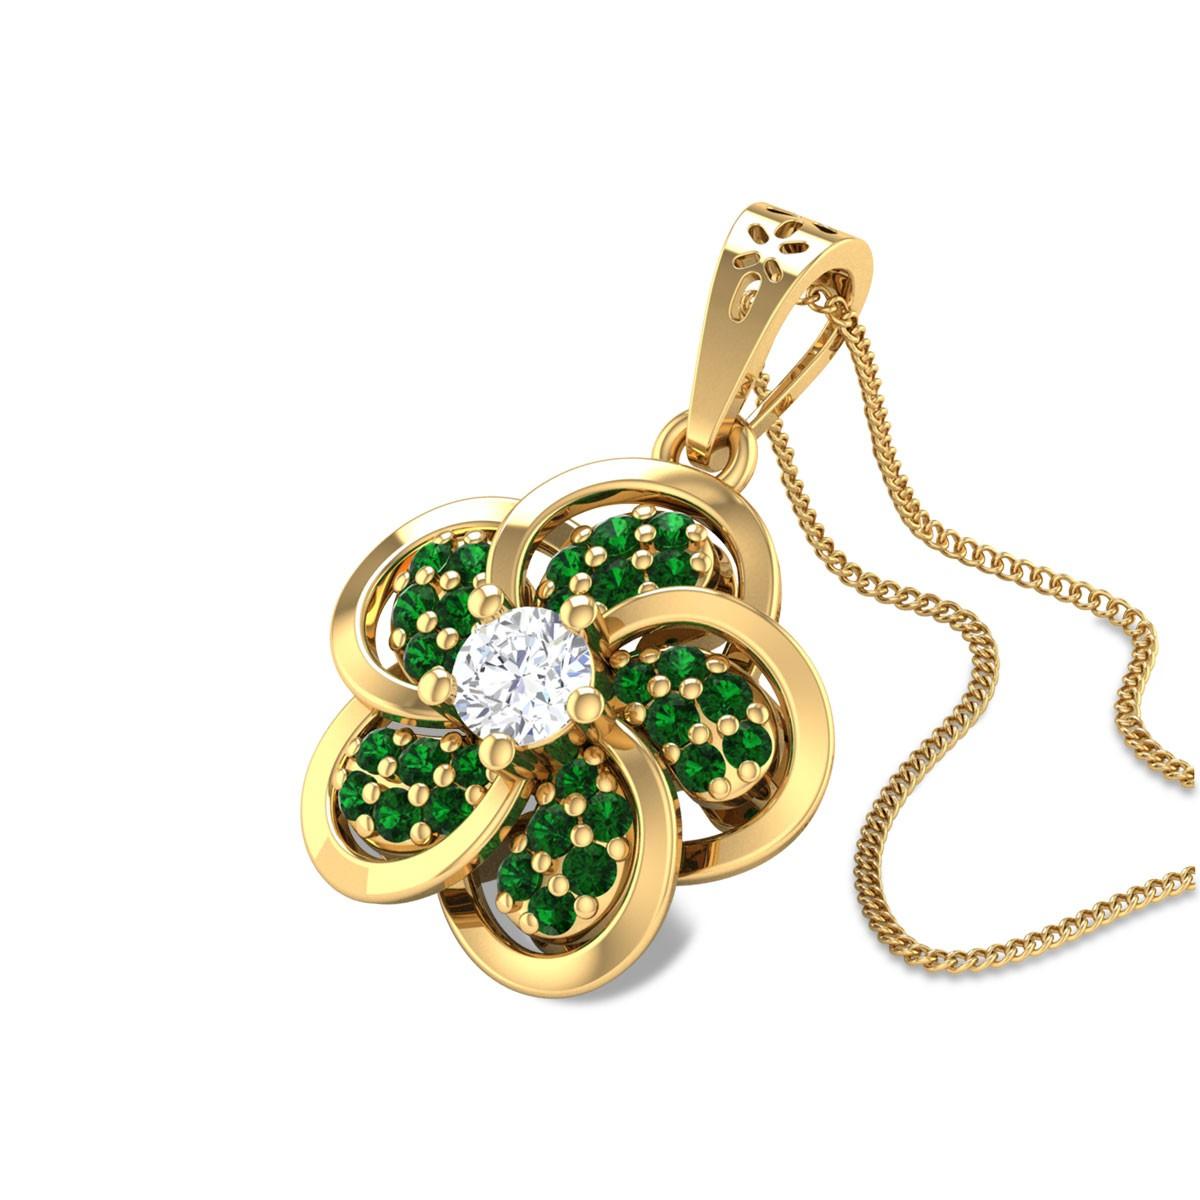 Abeer Floral Emerald Pendant